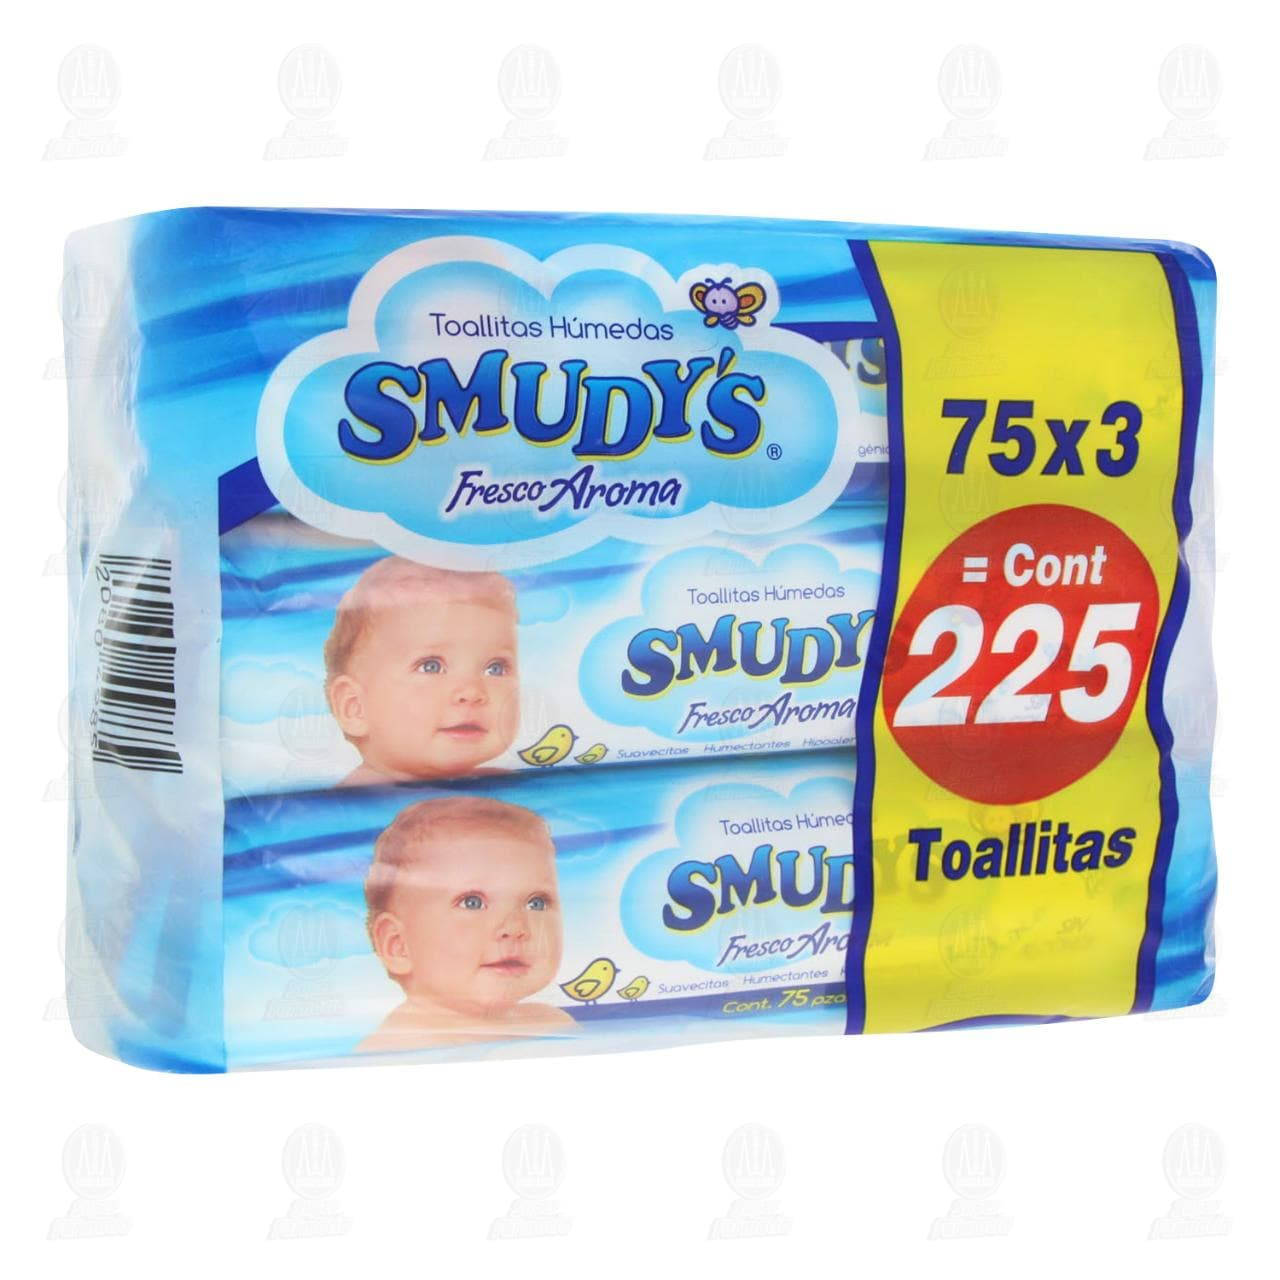 Comprar Pack Toallitas para Bebé Smudy's Fresco Aroma, 3 pzas. en Farmacias Guadalajara